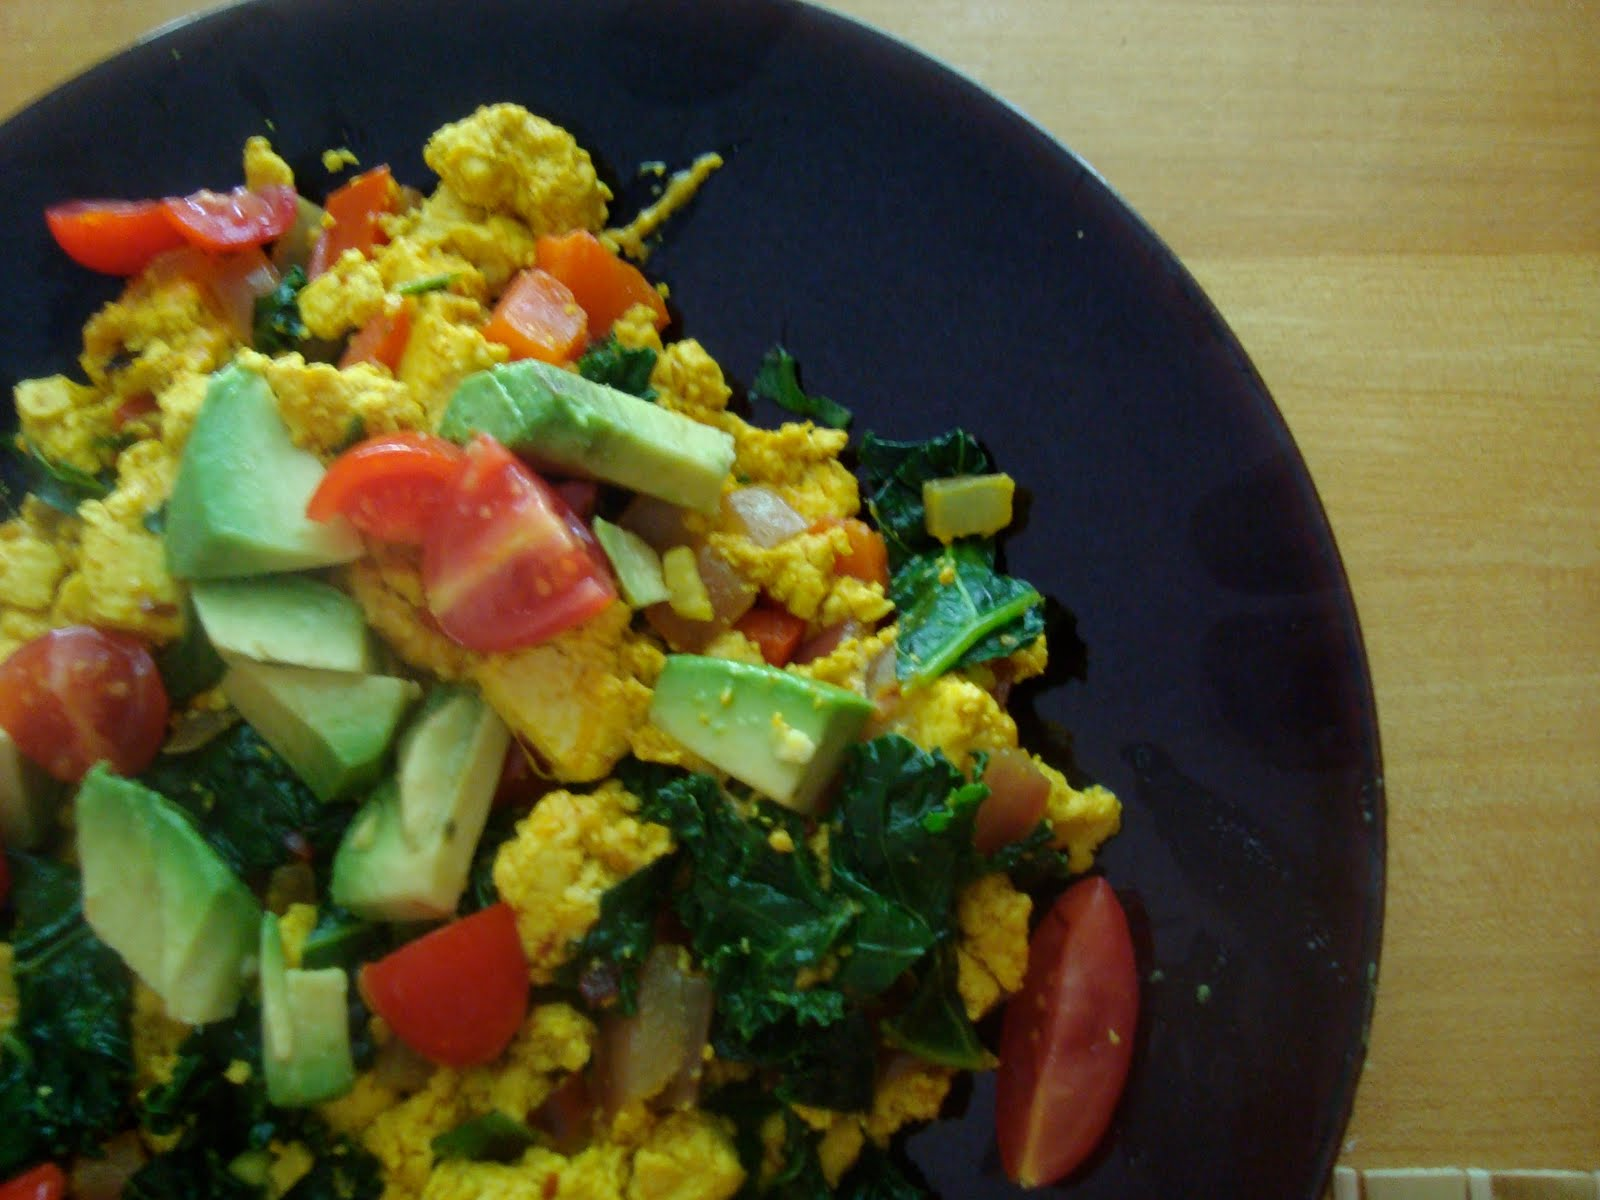 Awesome Vegan Tofu Scramble for Breakfast